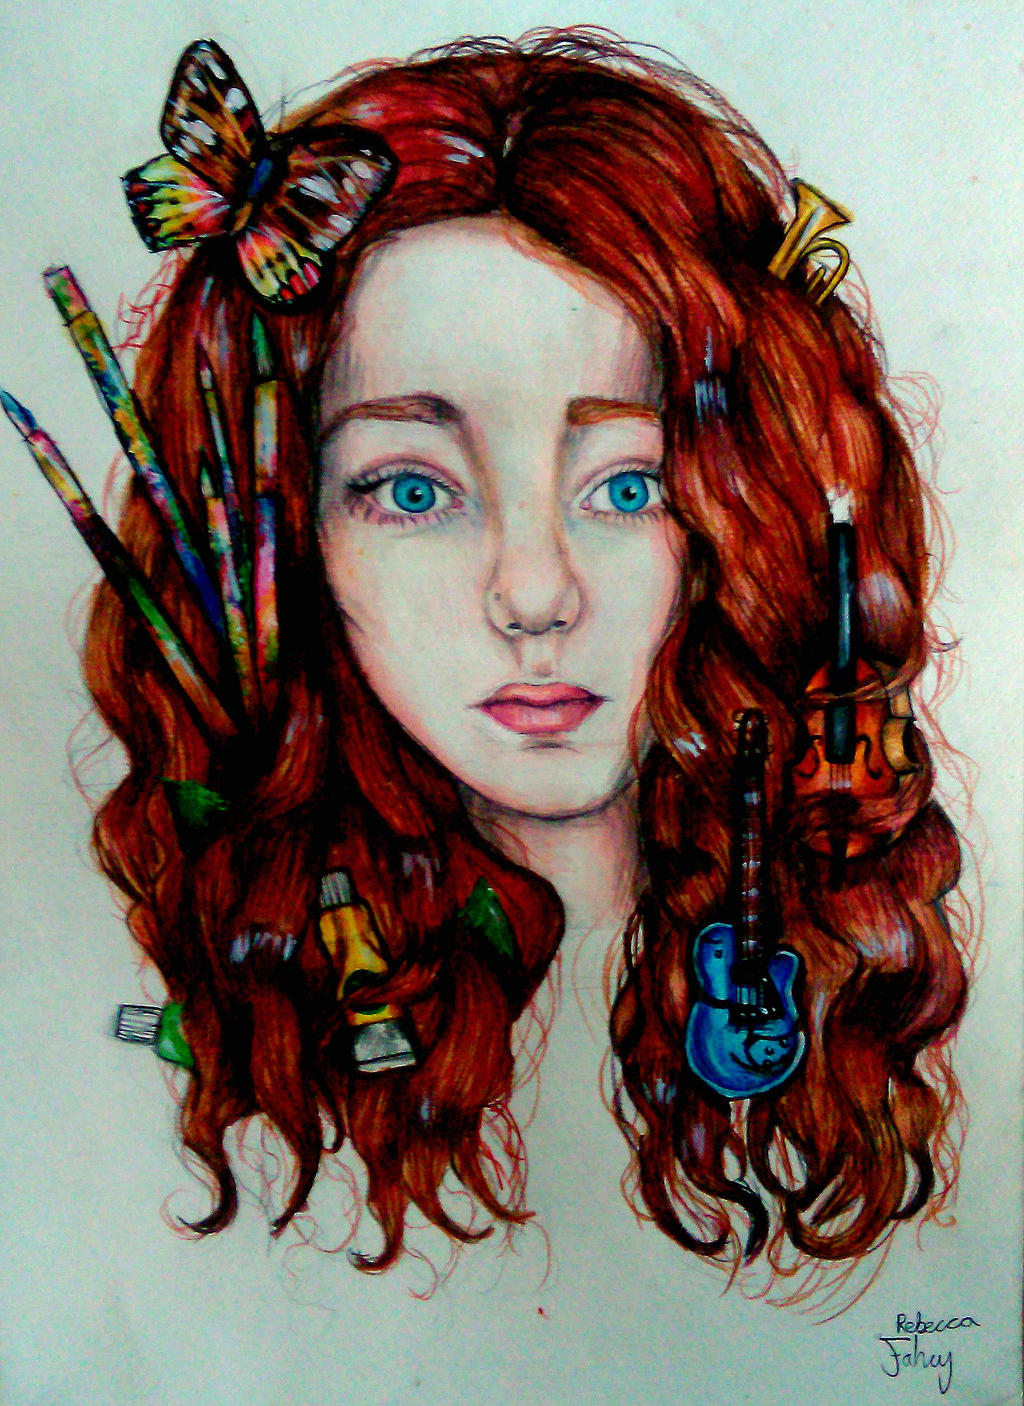 self portrait by Canthearmyeyes